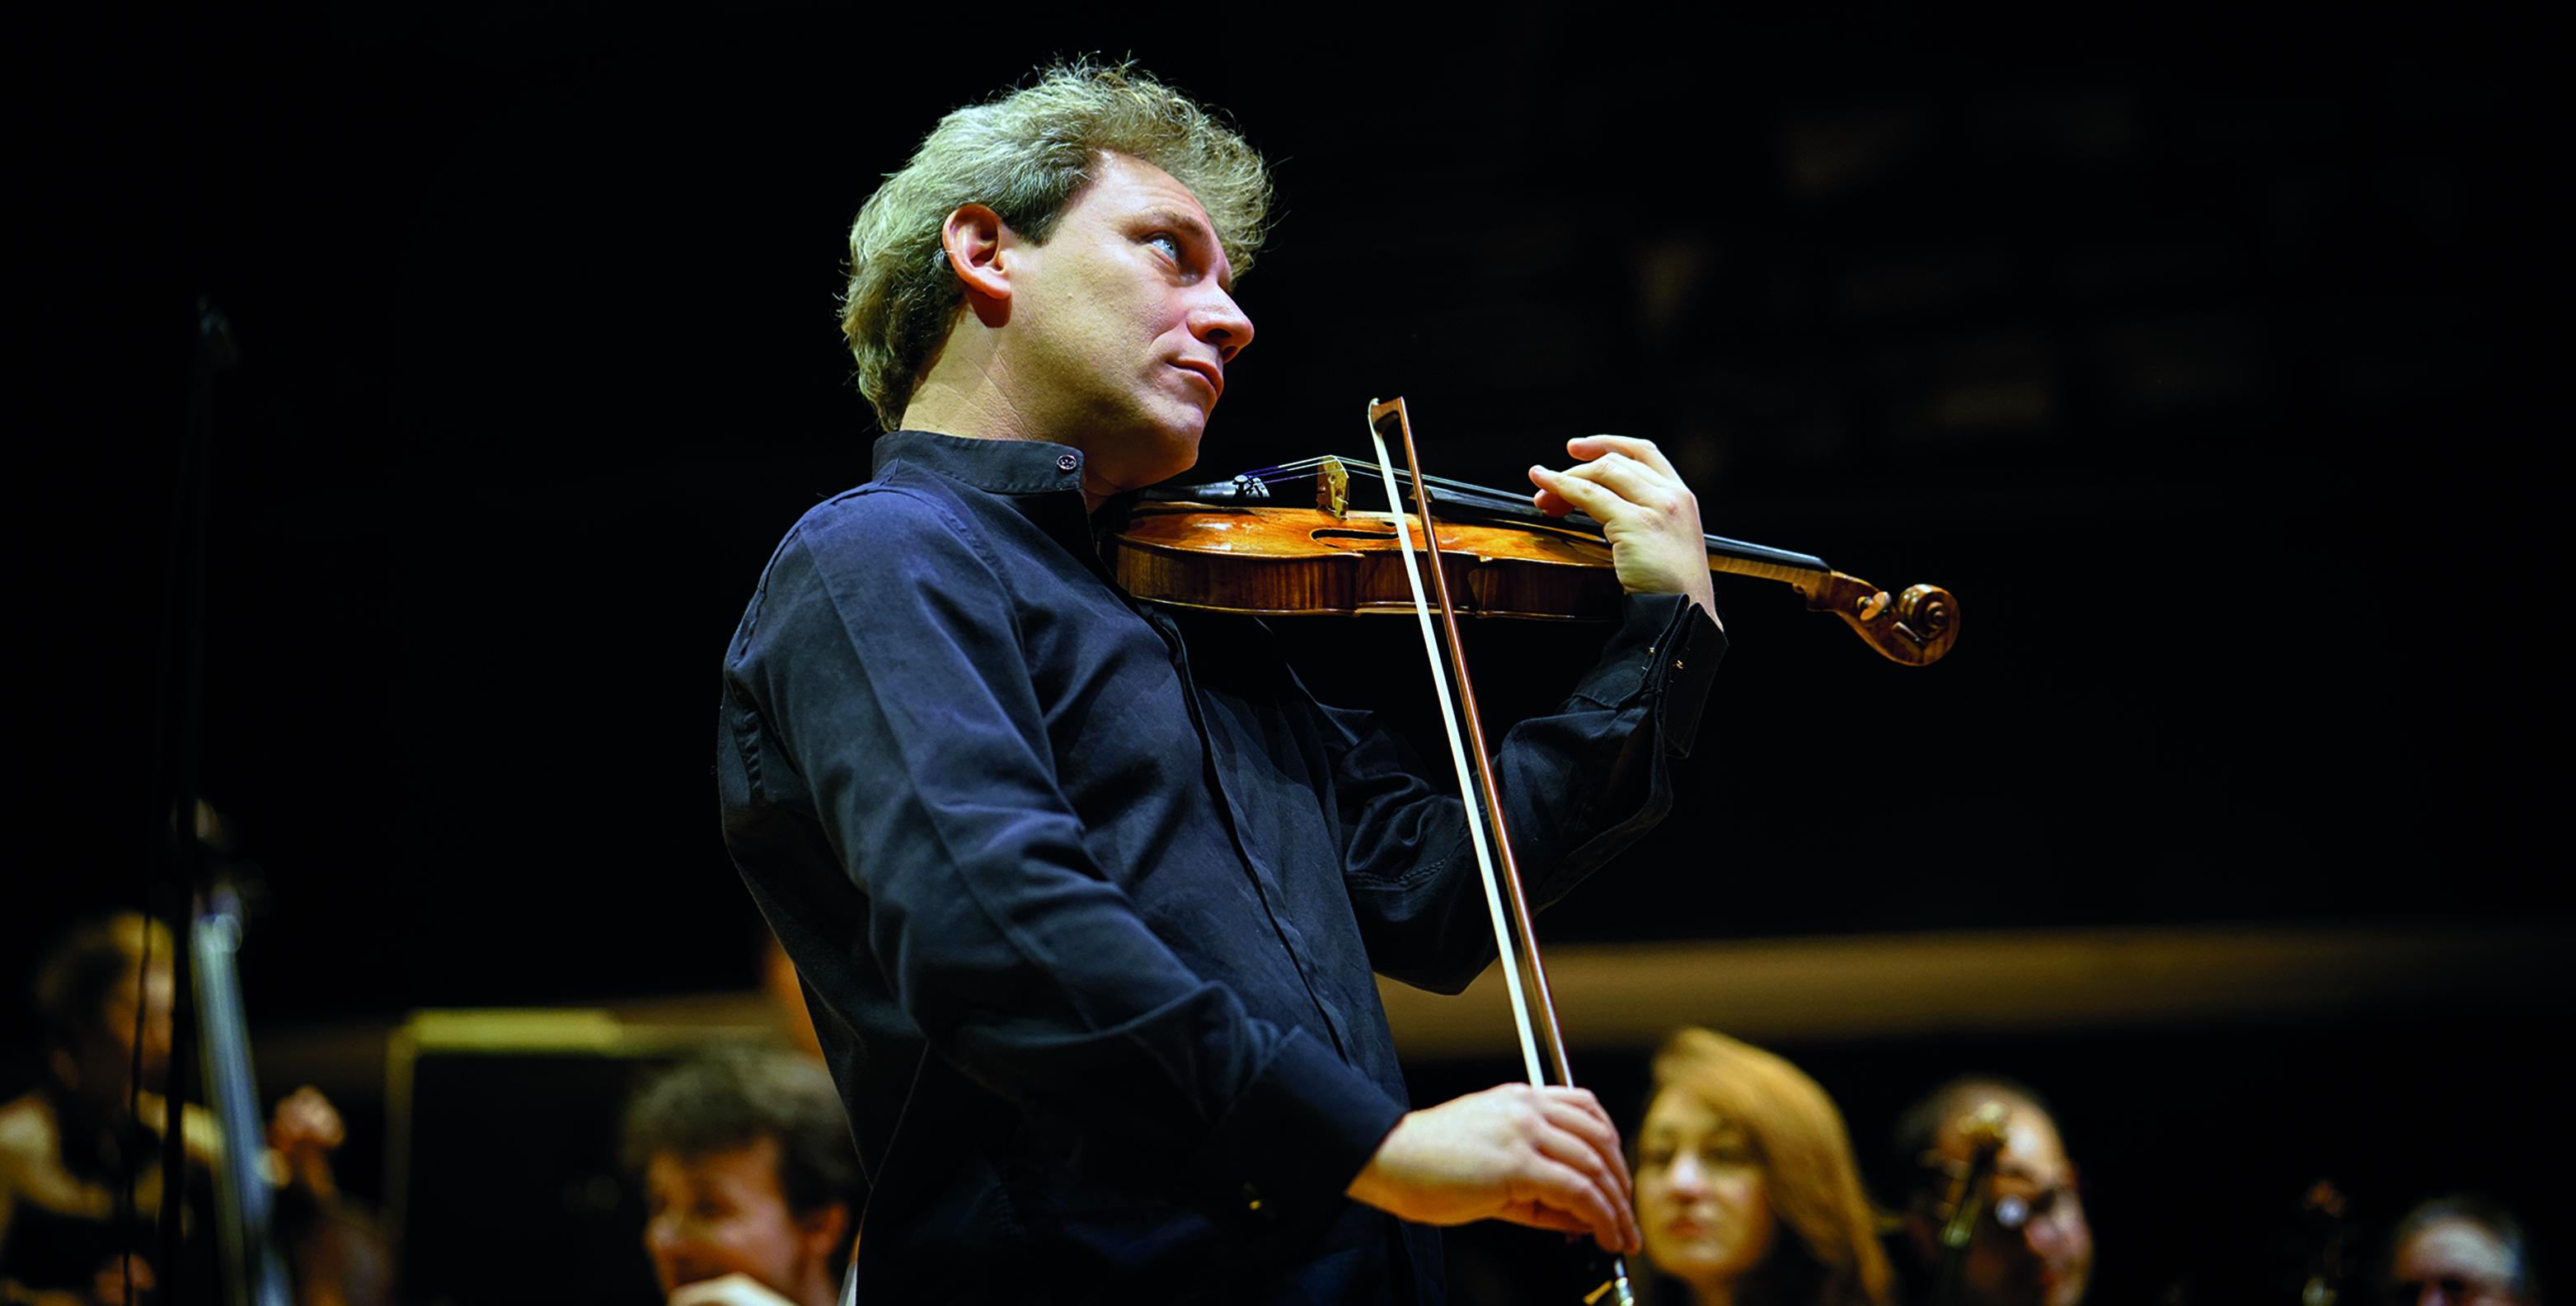 David Grimal